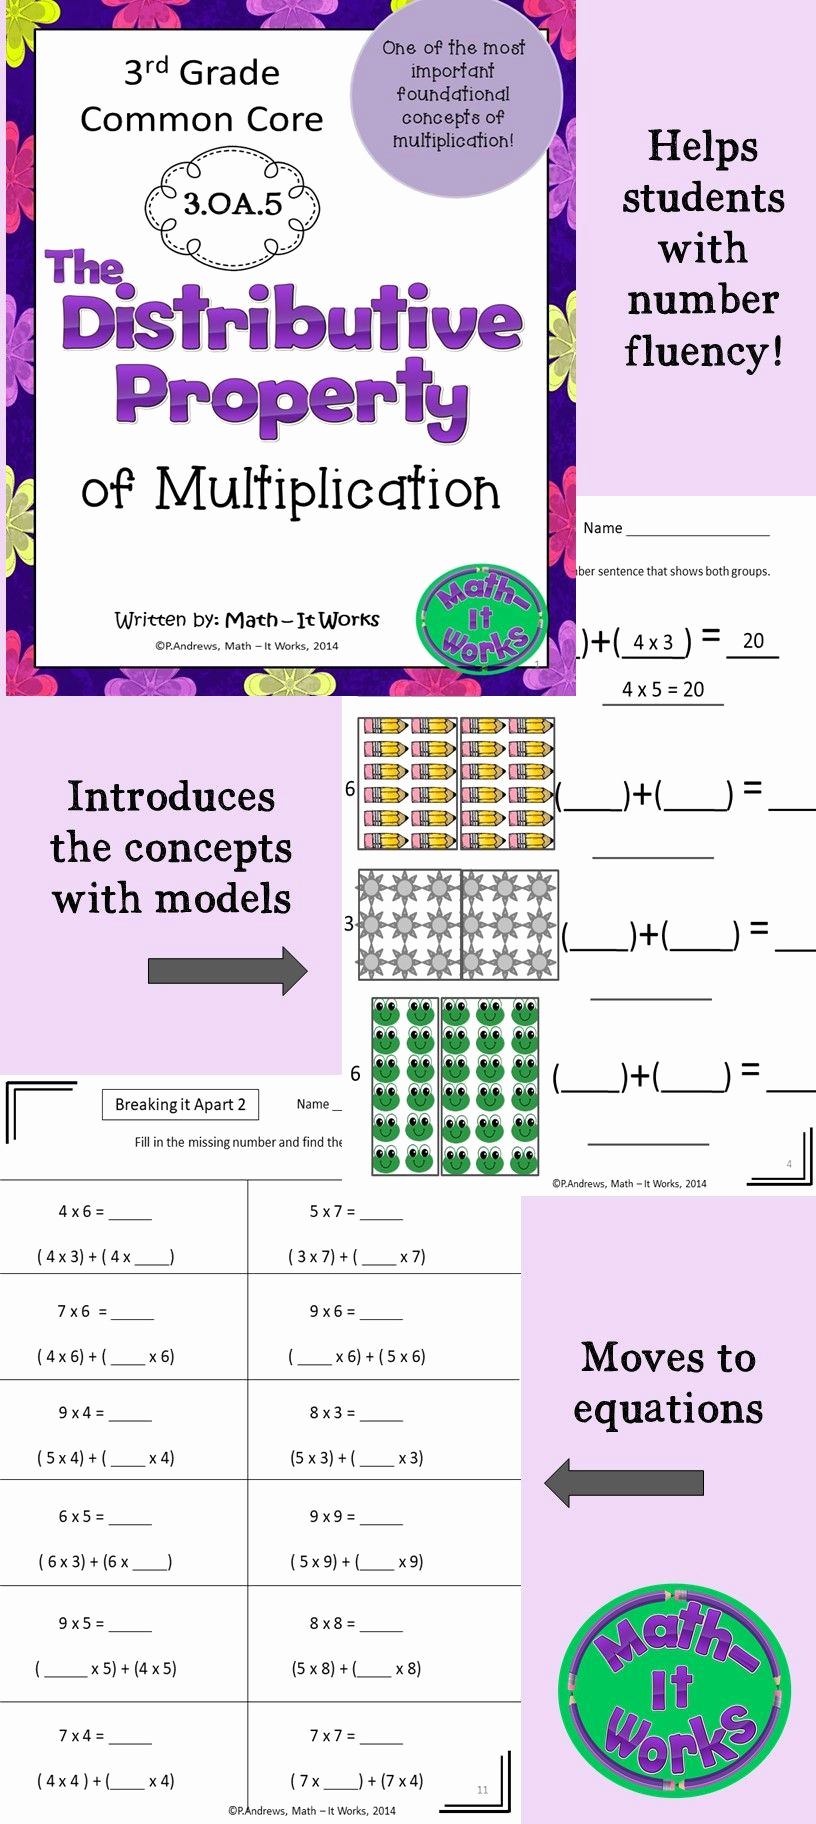 3rd Grade Distributive Property Worksheets Luxury 3rd Grade Distributive Property Worksheets